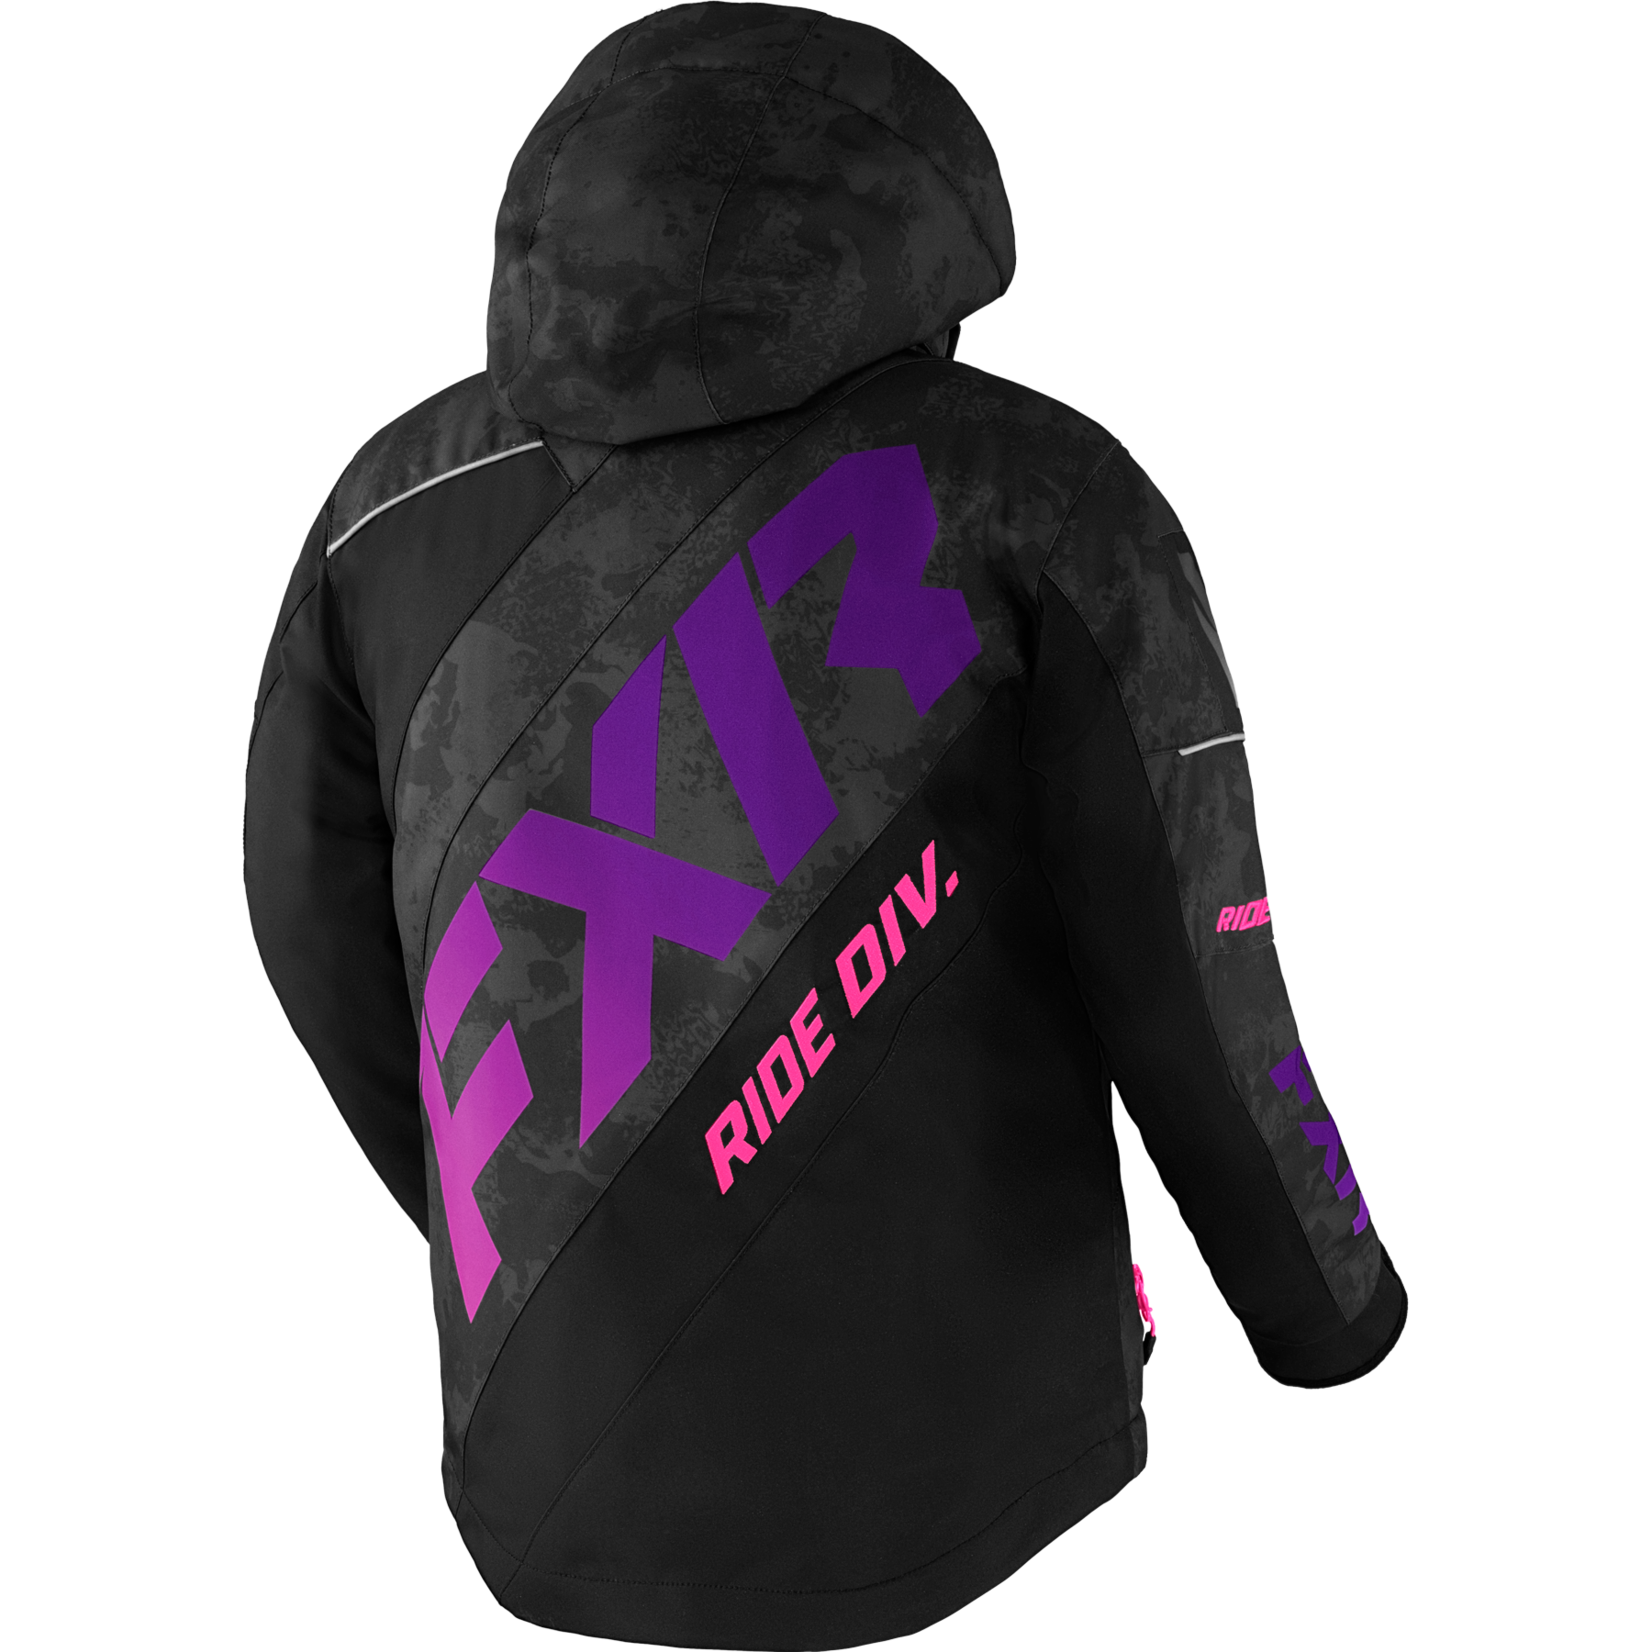 FXR FXR Youth CX Jacket - Black Camo/Purple Fade